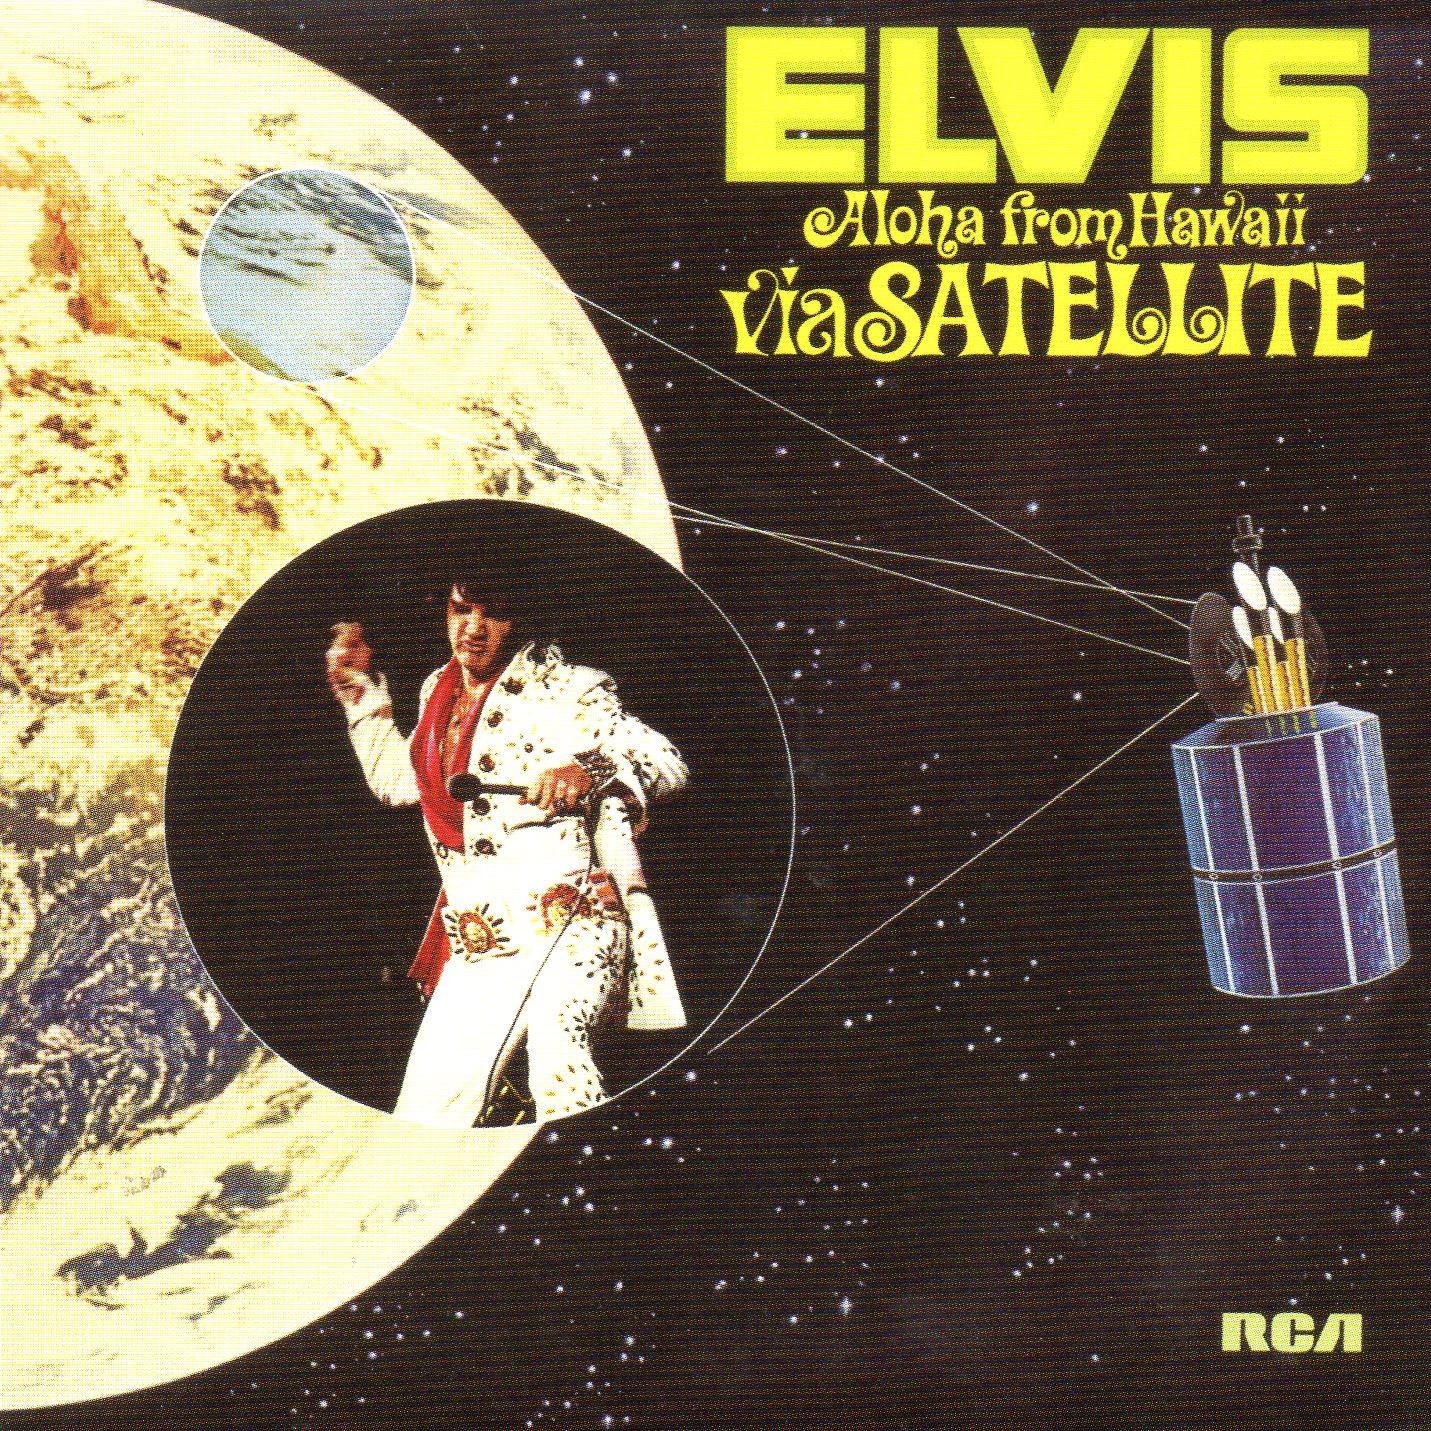 Elvis PRESLEY - Aloha From Hawaii Via Satellite (1973 - Mini Lp Replica - 24-track Card Sleeve)